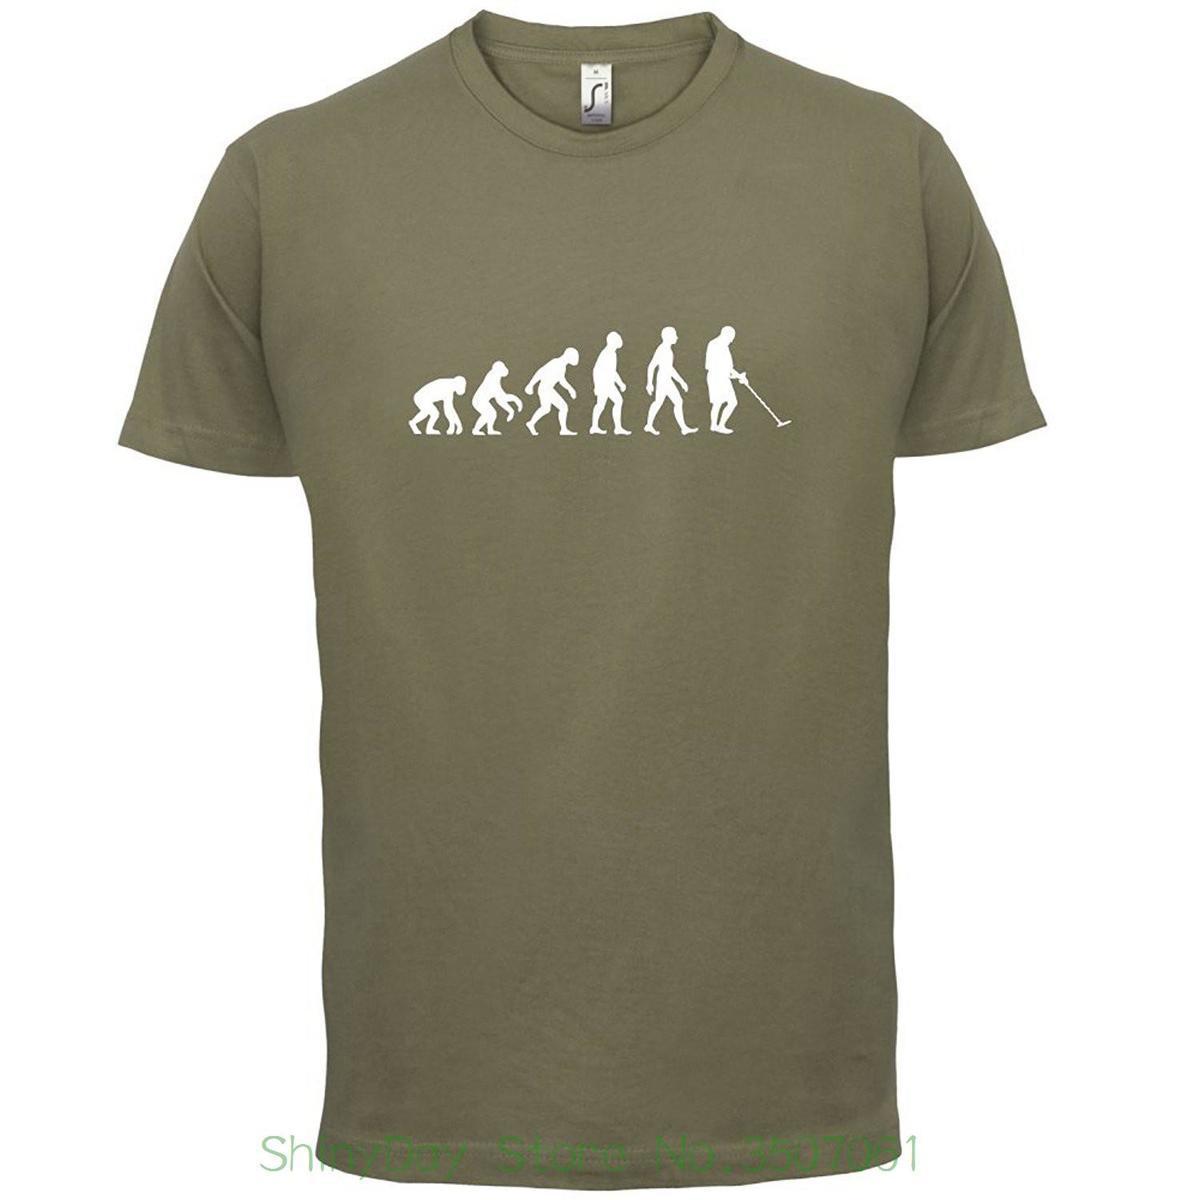 502c7de4477ee New Design Cotton Male Tee Shirt Designing Men S Evolution Of Man Metal  Detector T Shirt 10 Colours Buy Tee Shirts Great Tee Shirts From Lijian82